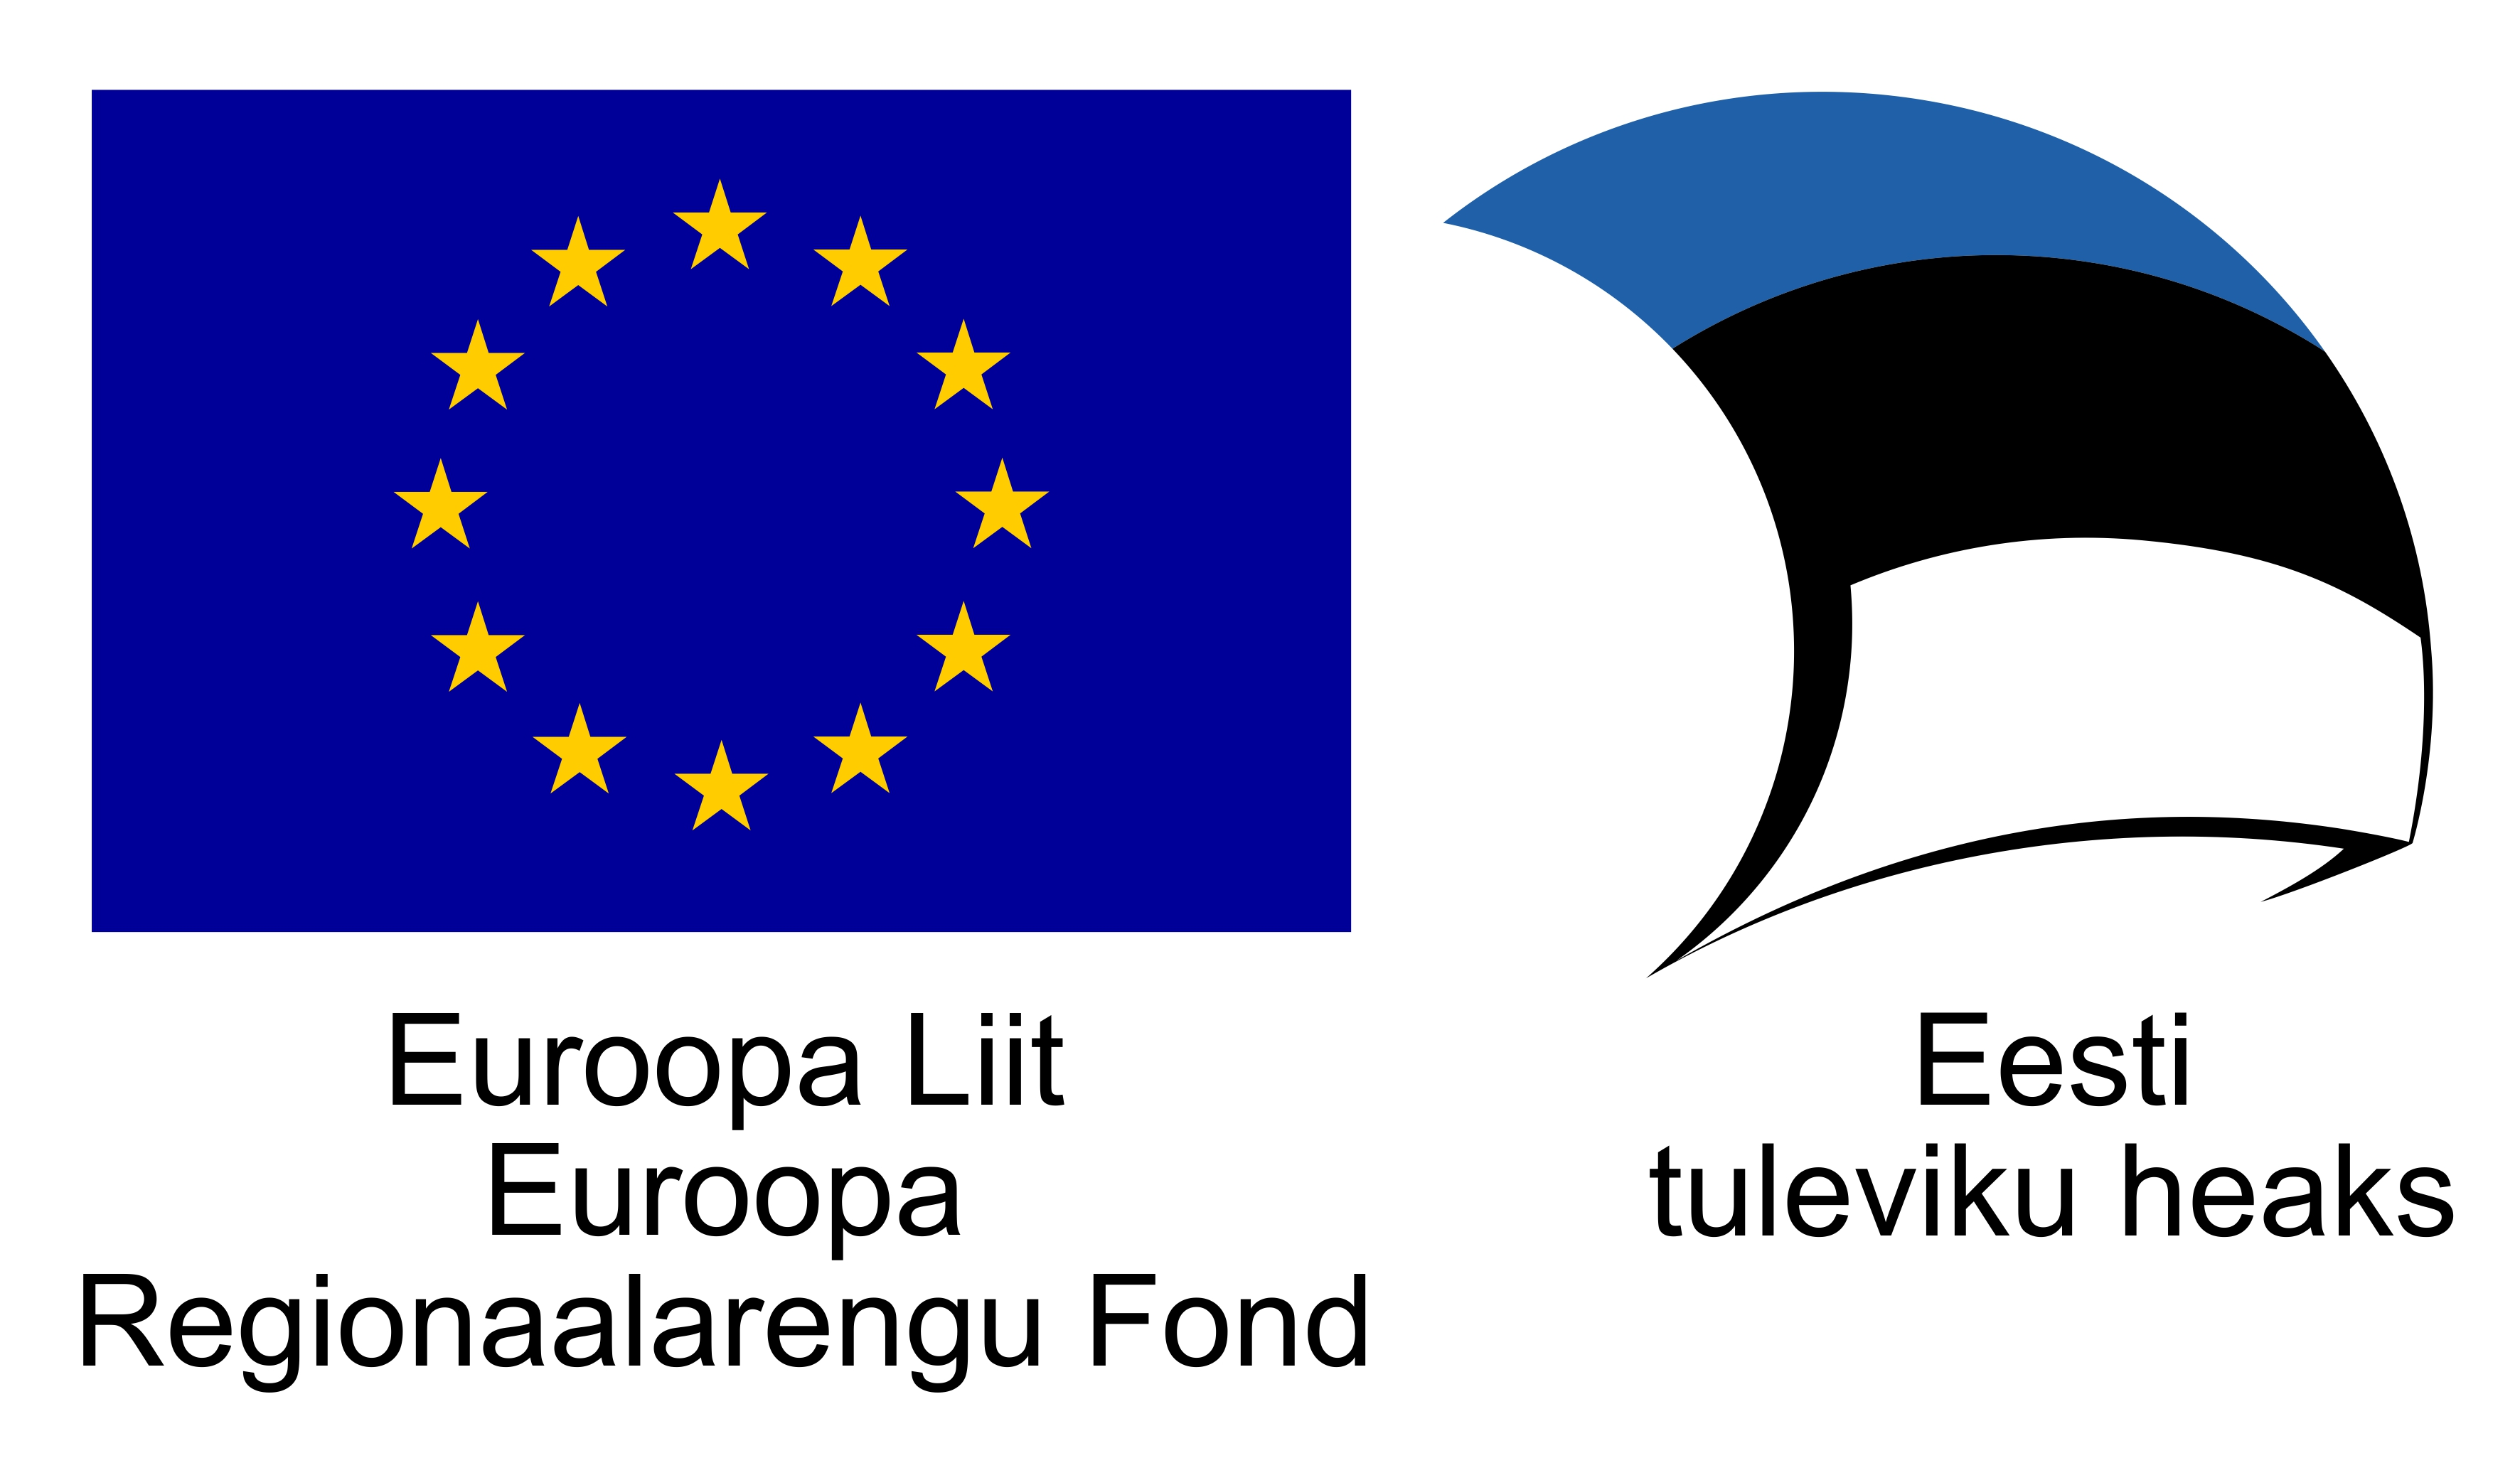 EL_Regionaalarengu_Fond_horisontaalne.jpg (3544×2051)